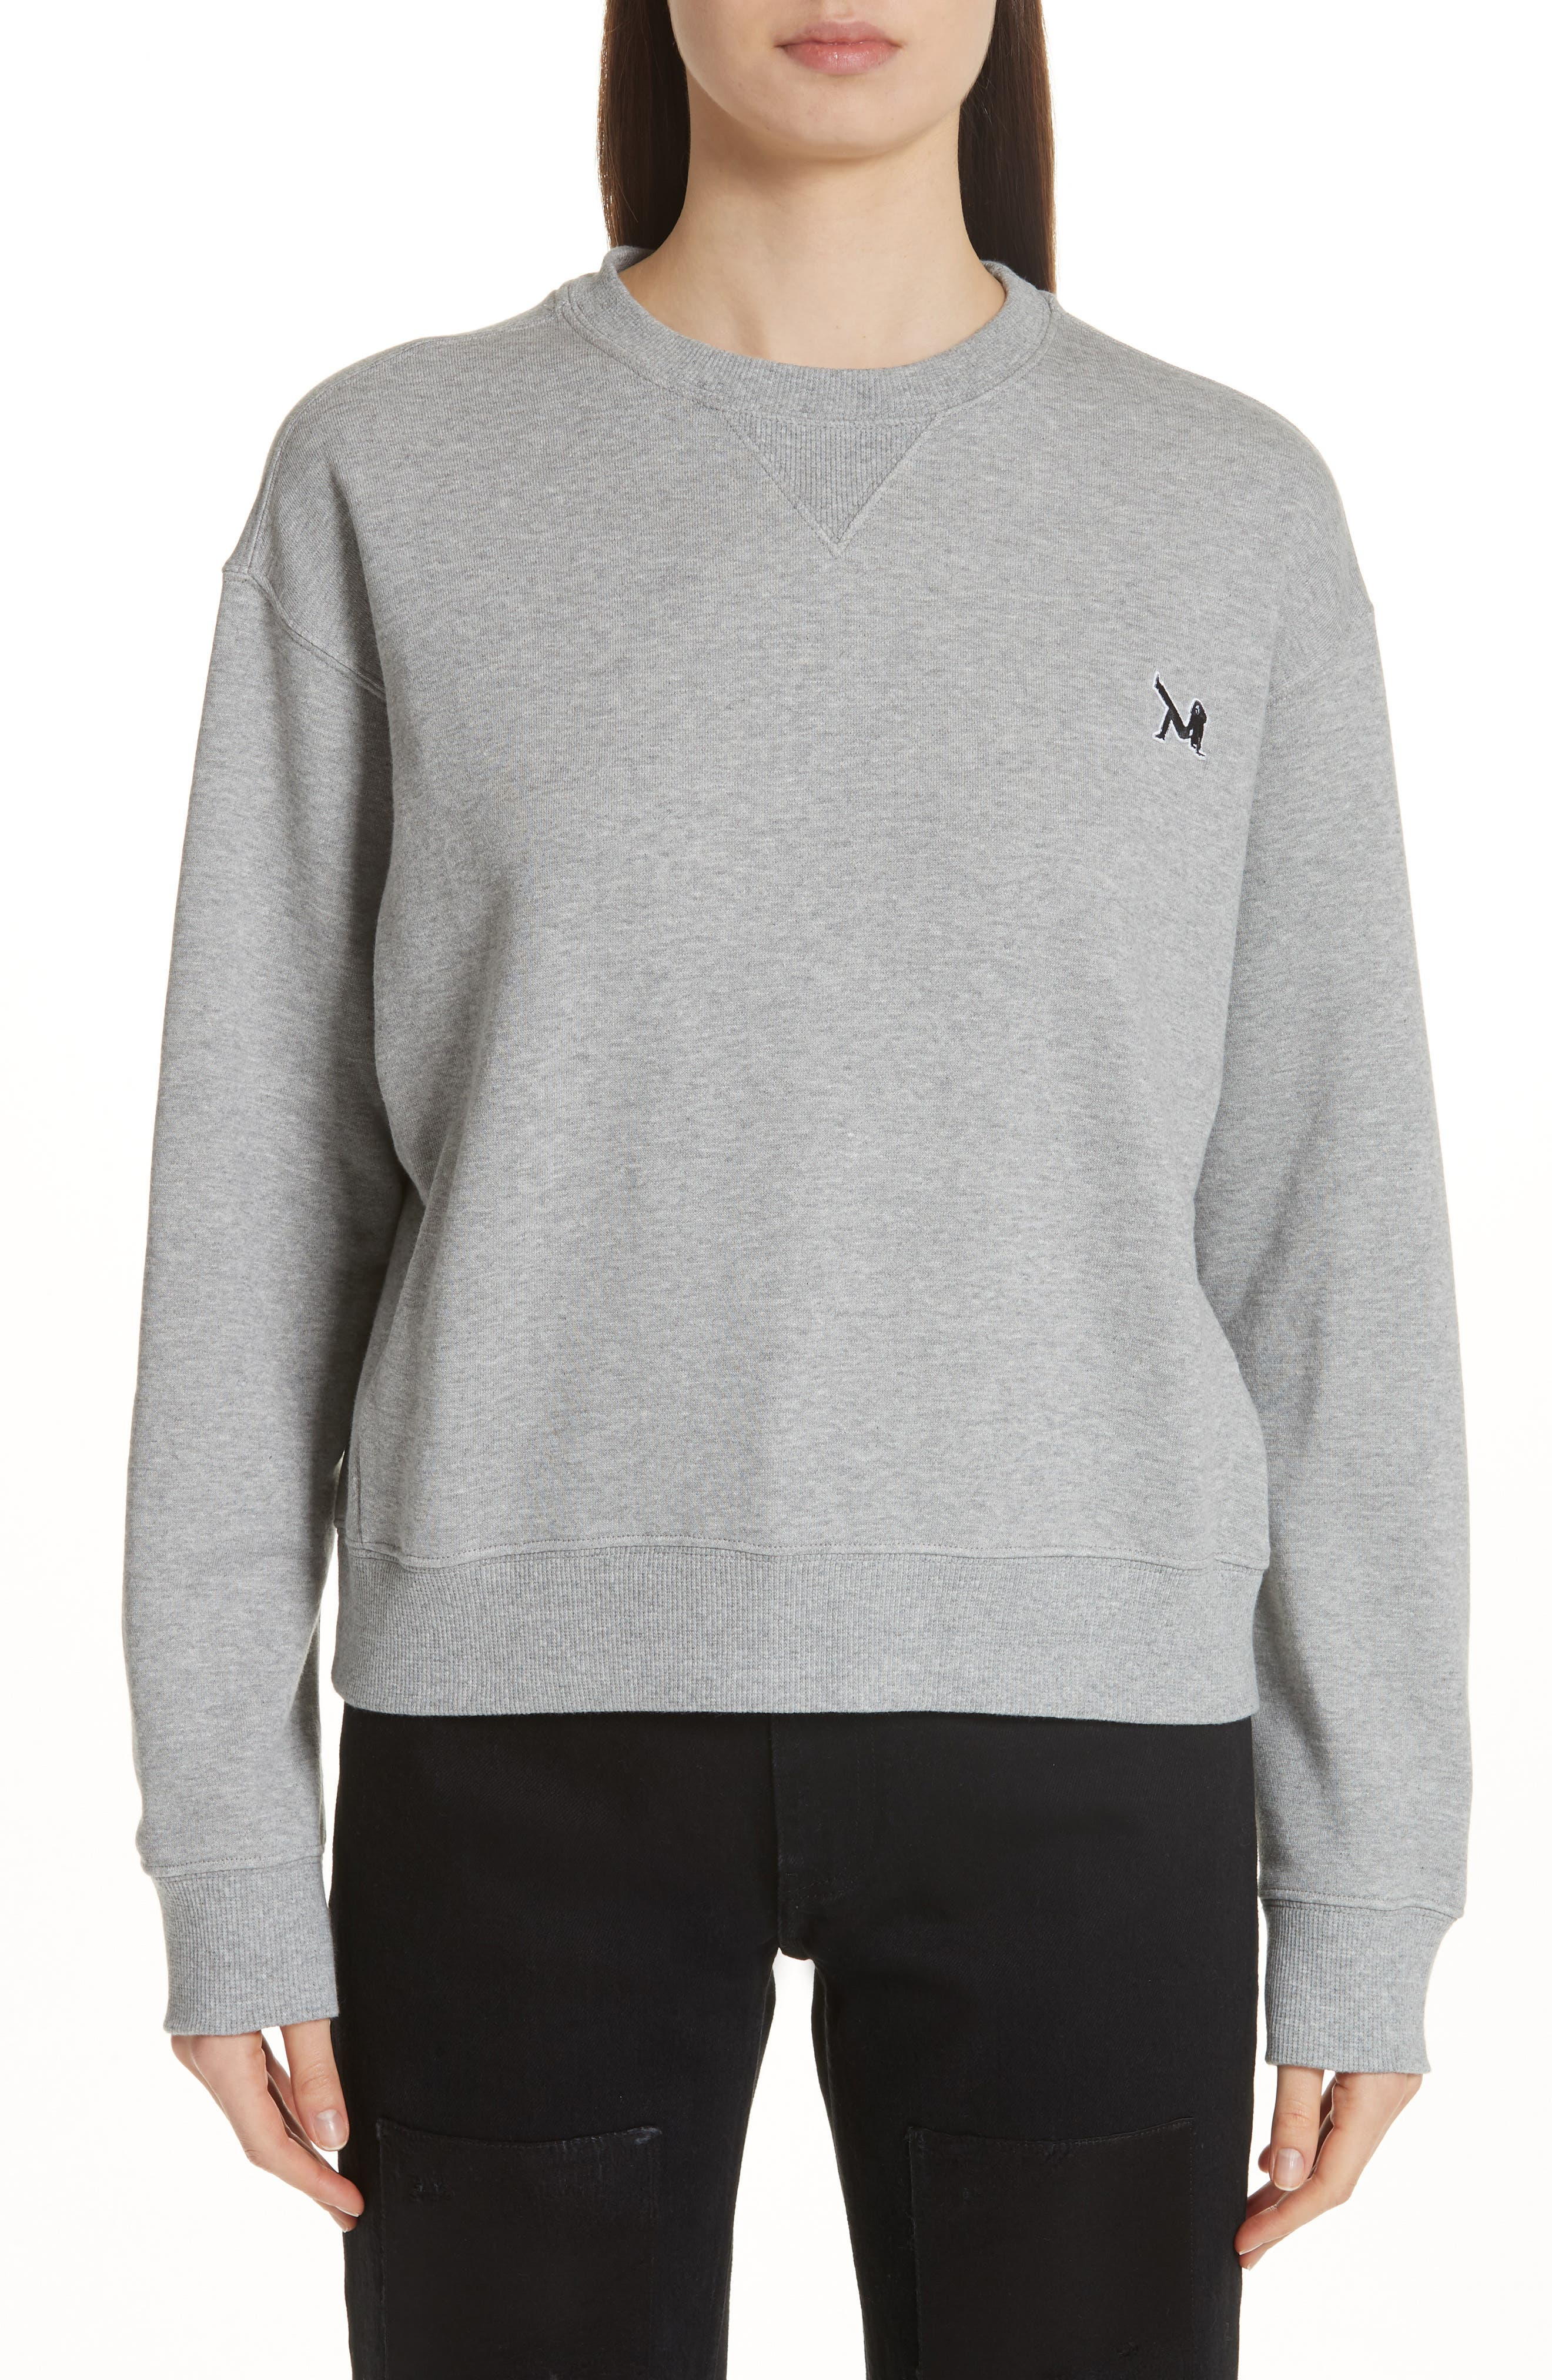 Brooke Shields Patch Sweatshirt,                         Main,                         color, Grey